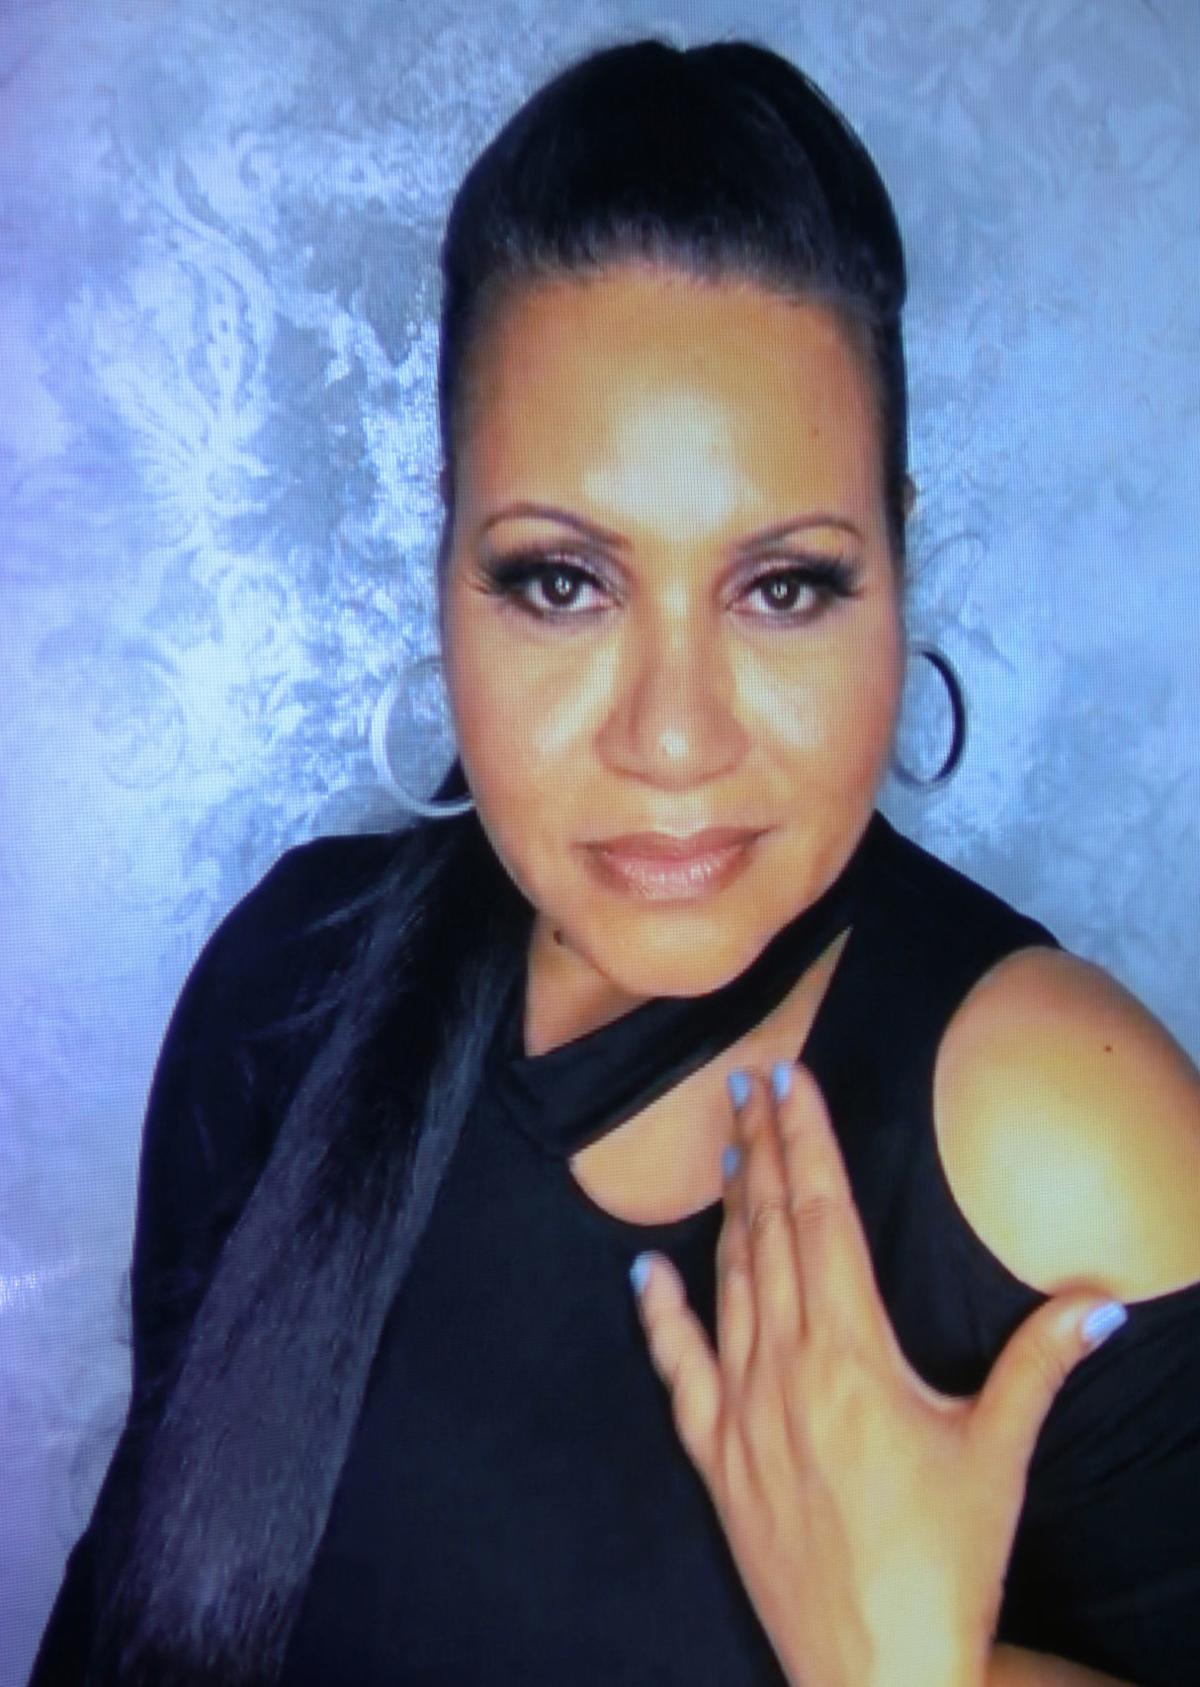 Cheryl James - Salt-N-Pepa